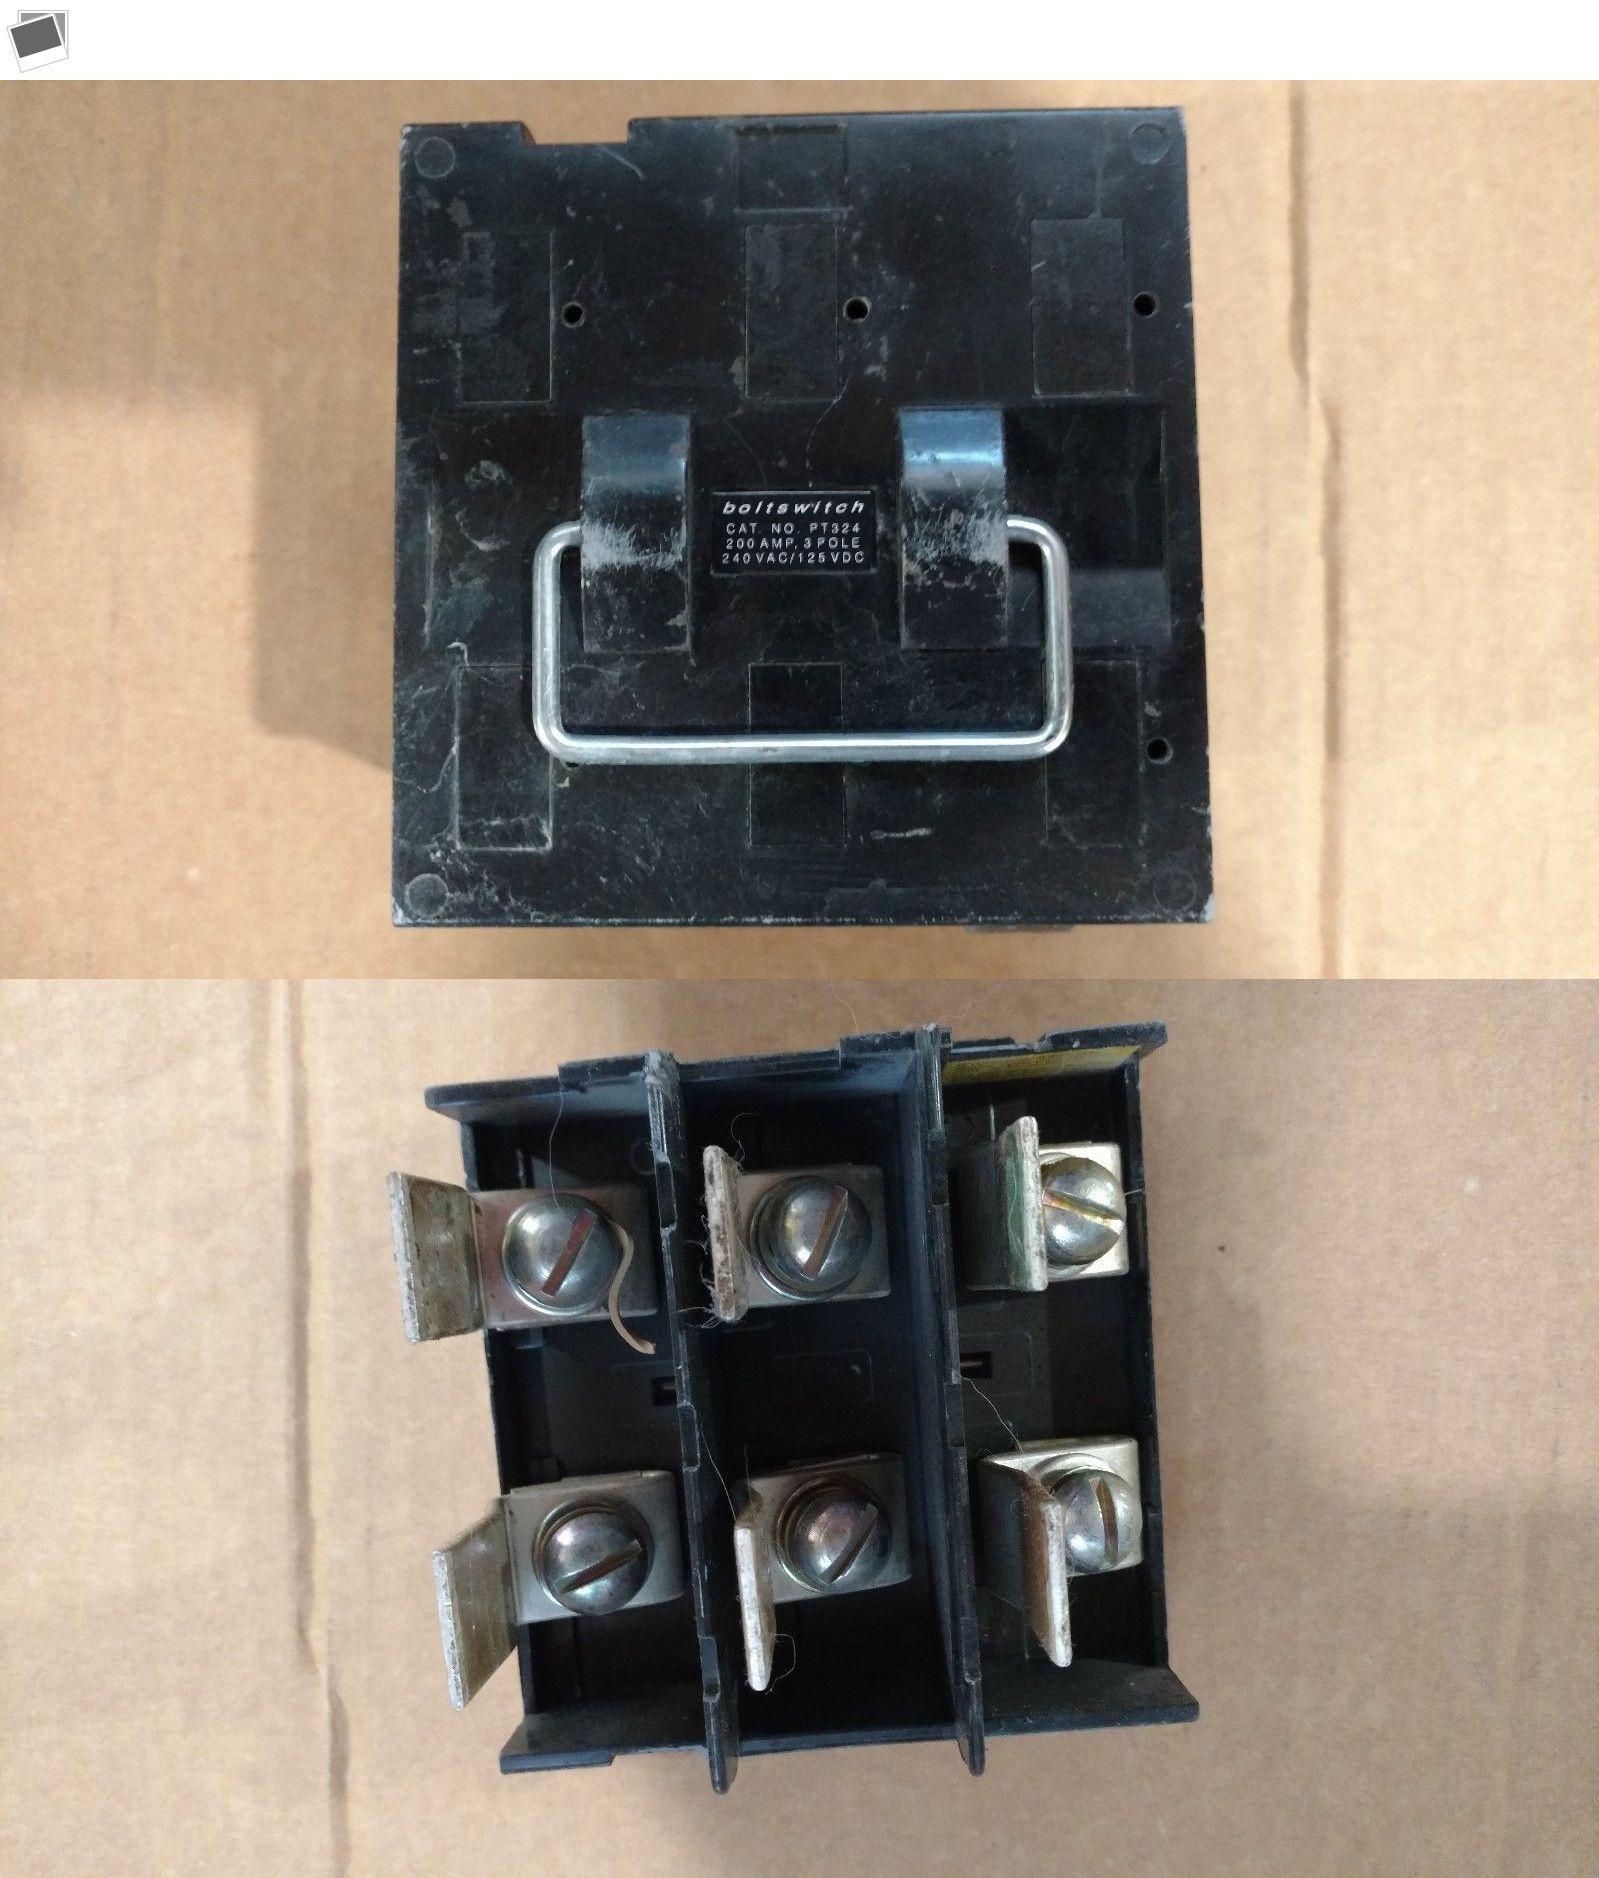 medium resolution of circuit breakers and fuse boxes 20596 boltswitch pt324 fusablecircuit breakers and fuse boxes 20596 boltswitch pt324